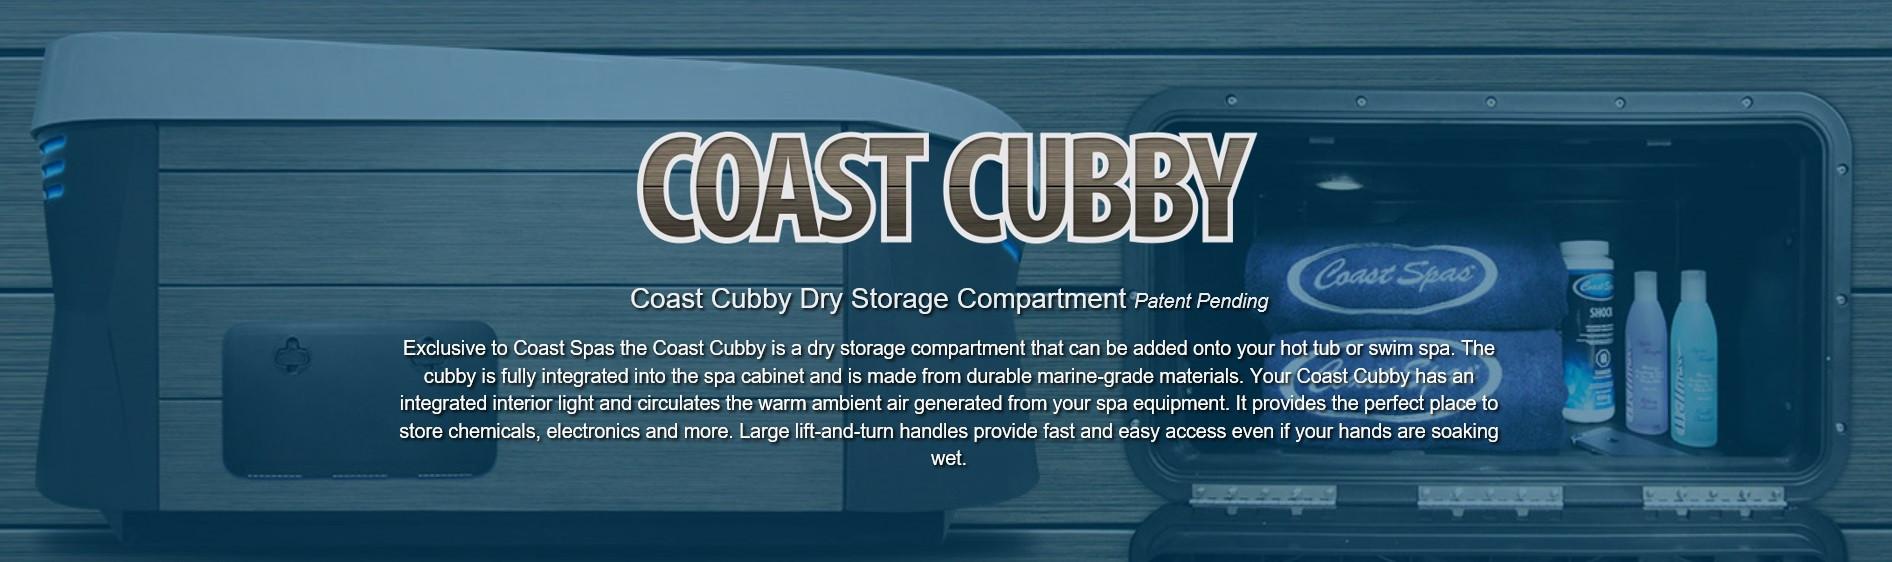 CoastCubby.jpg